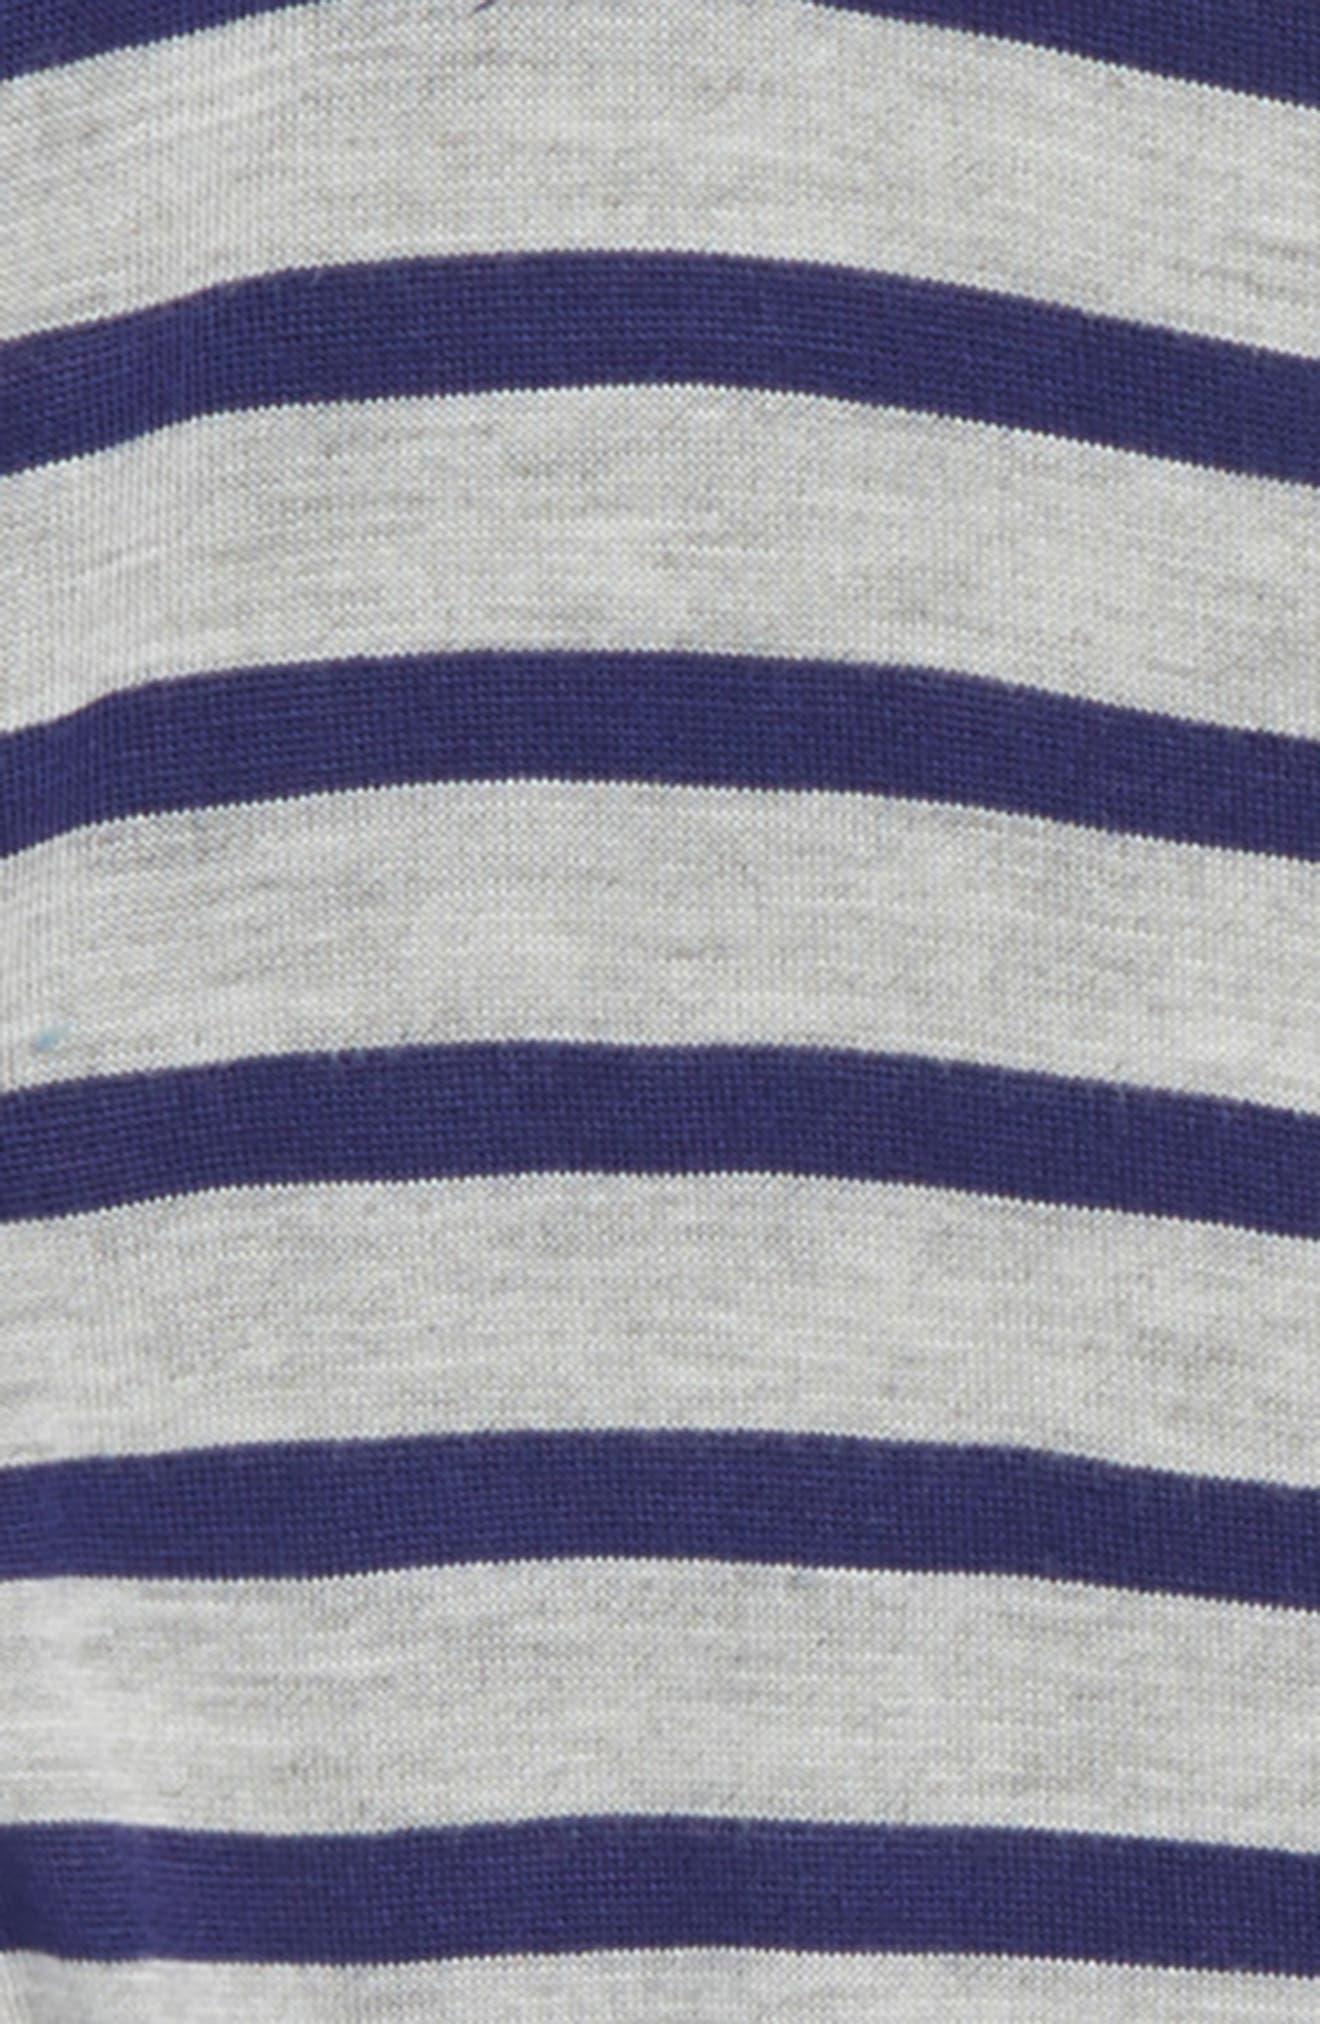 Stripe Knot Tee,                             Alternate thumbnail 2, color,                             Grey Ash Heather- Navy Stripe